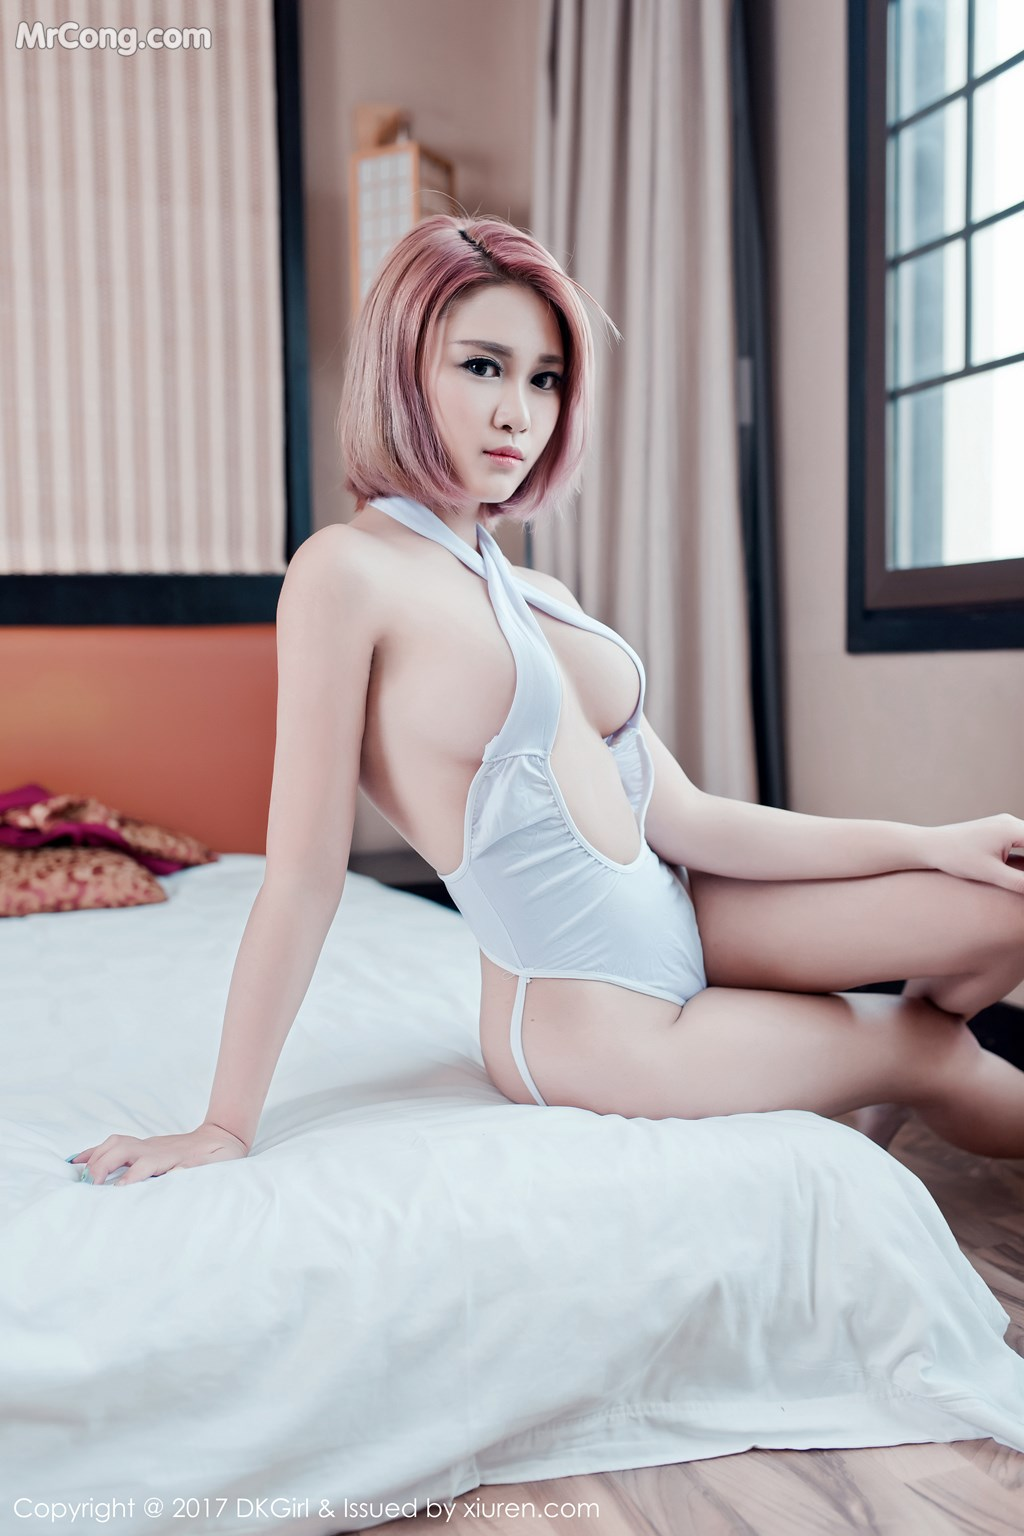 Image DKGirl-Vol.045-Meng-Bao-Er-BoA-MrCong.com-012 in post DKGirl Vol.045: Người mẫu Meng Bao Er (萌宝儿BoA) (56 ảnh)